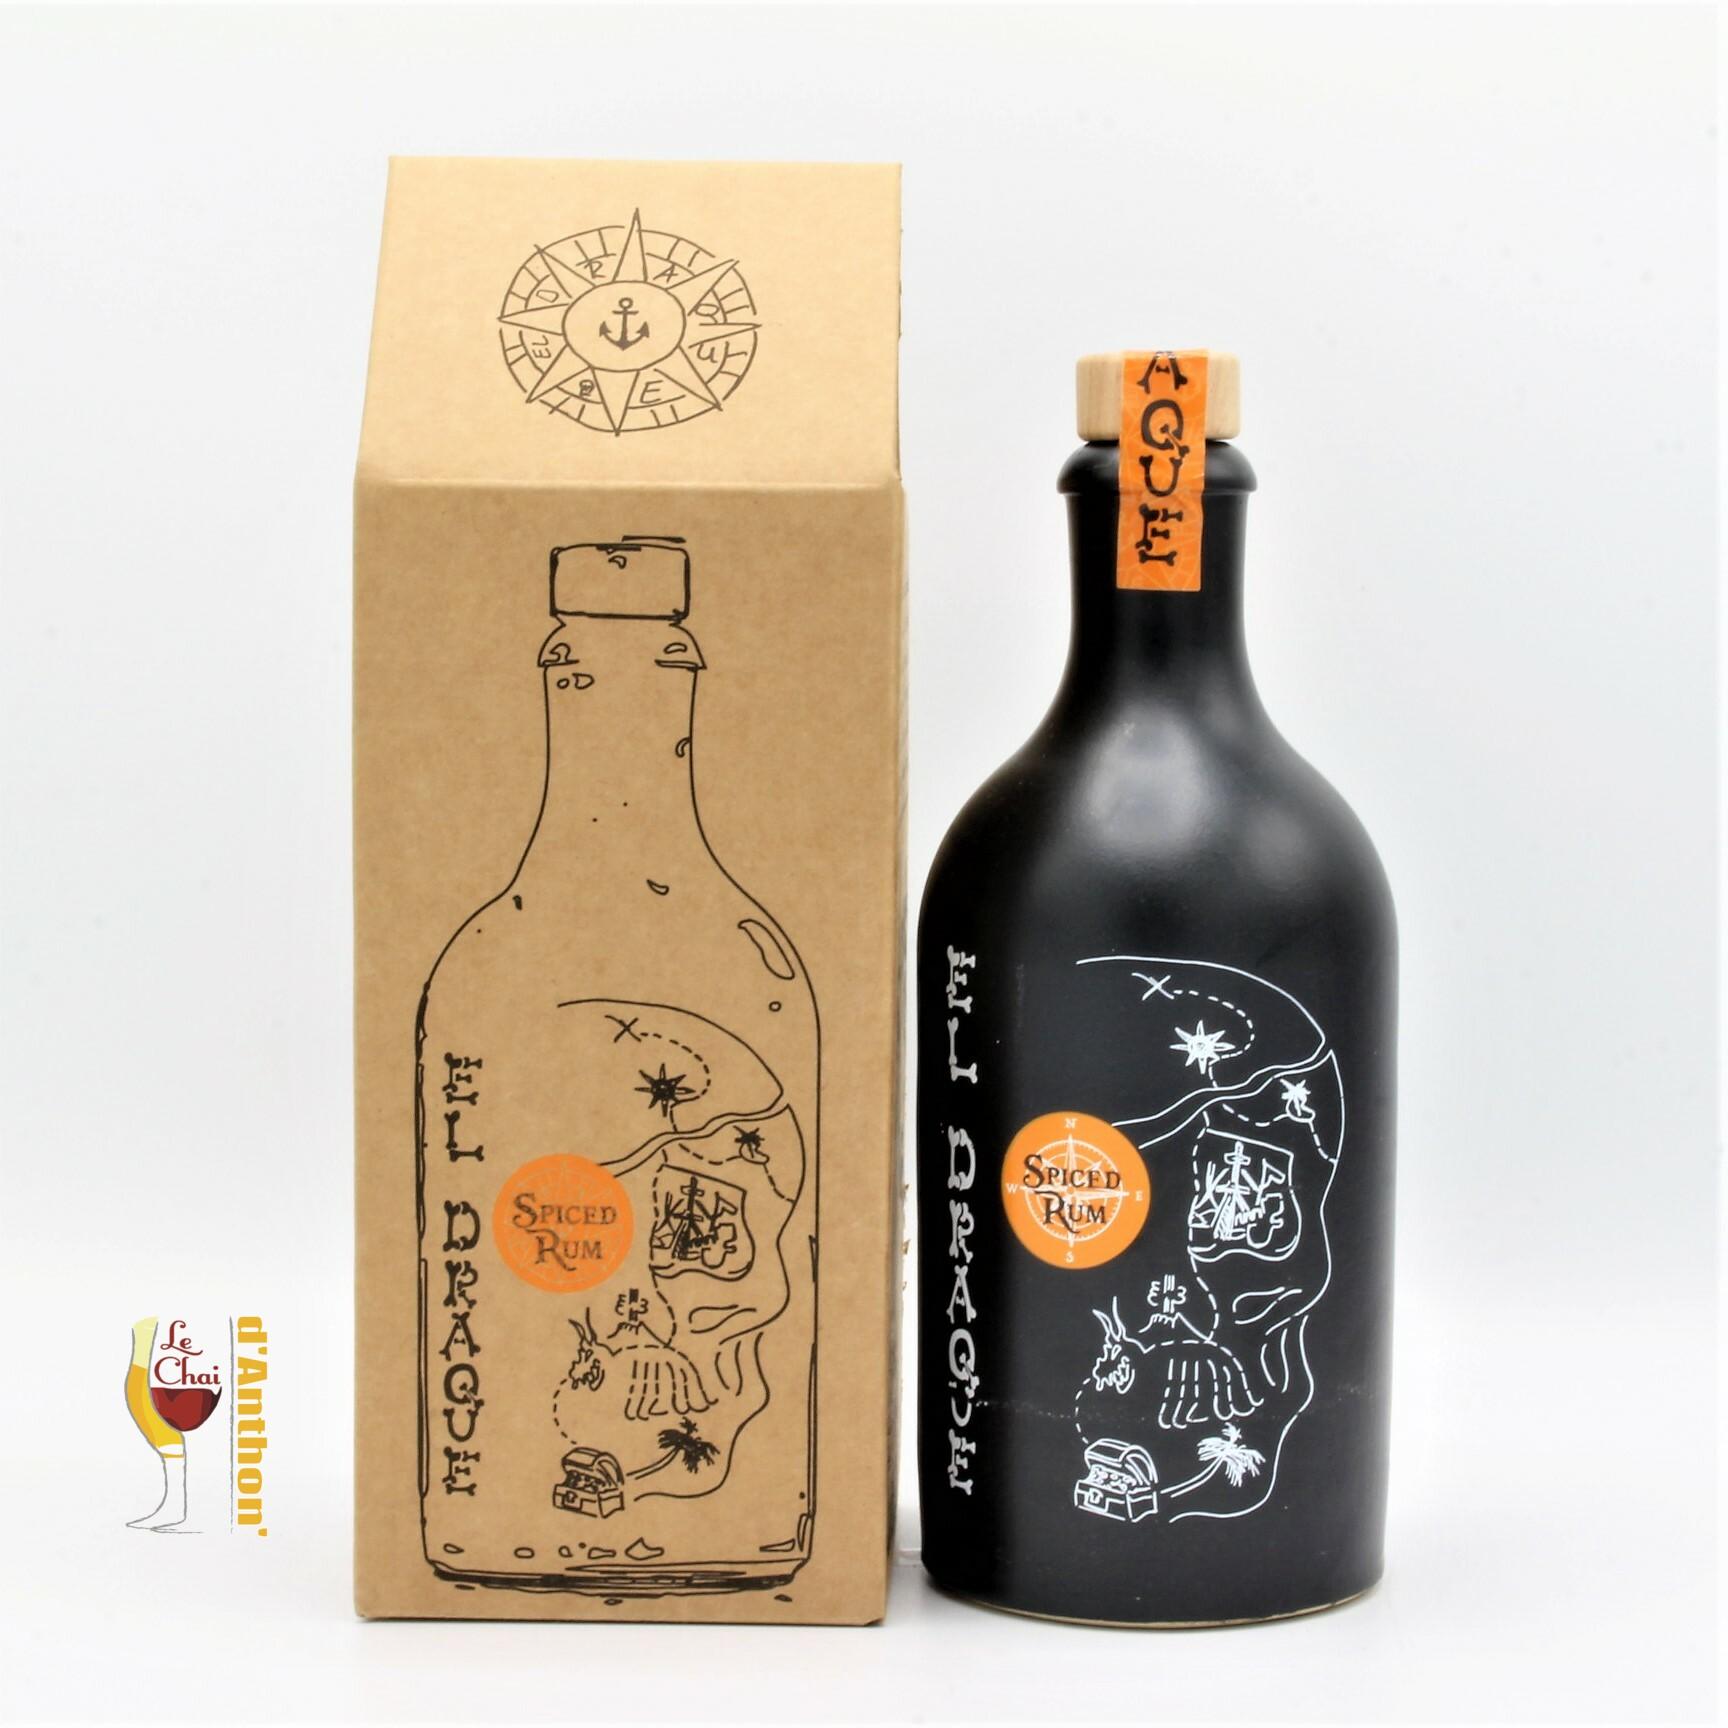 Le Chai D&931.JPG039;Anthon Spiritueux Rhum Spiced Traditionnel El Draque Mayenne 50cl 931